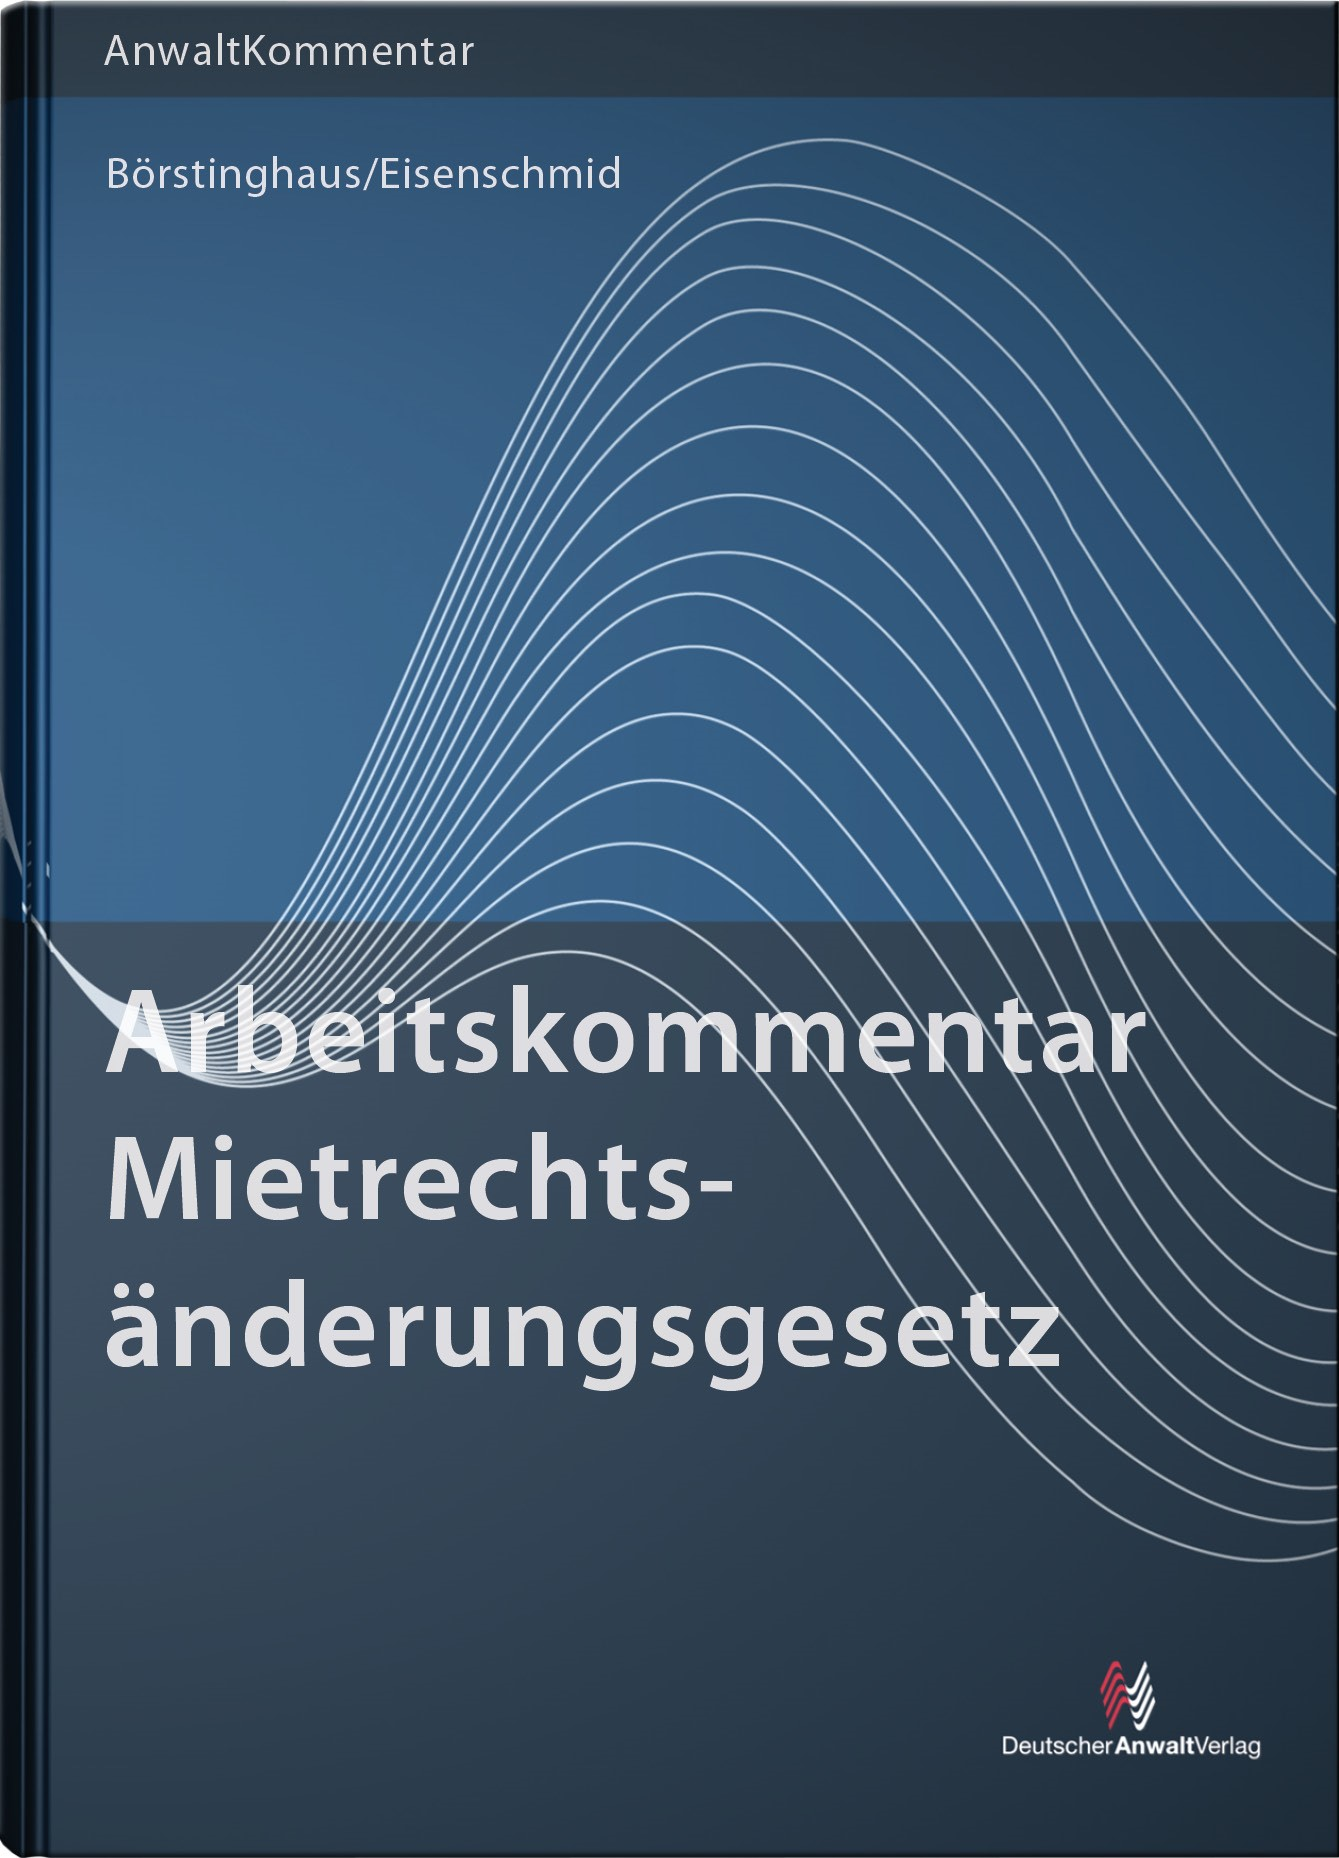 ArbeitsKommentar Mietrechtsänderungsgesetz | Börstinghaus / Eisenschmid, 2013 | Buch (Cover)